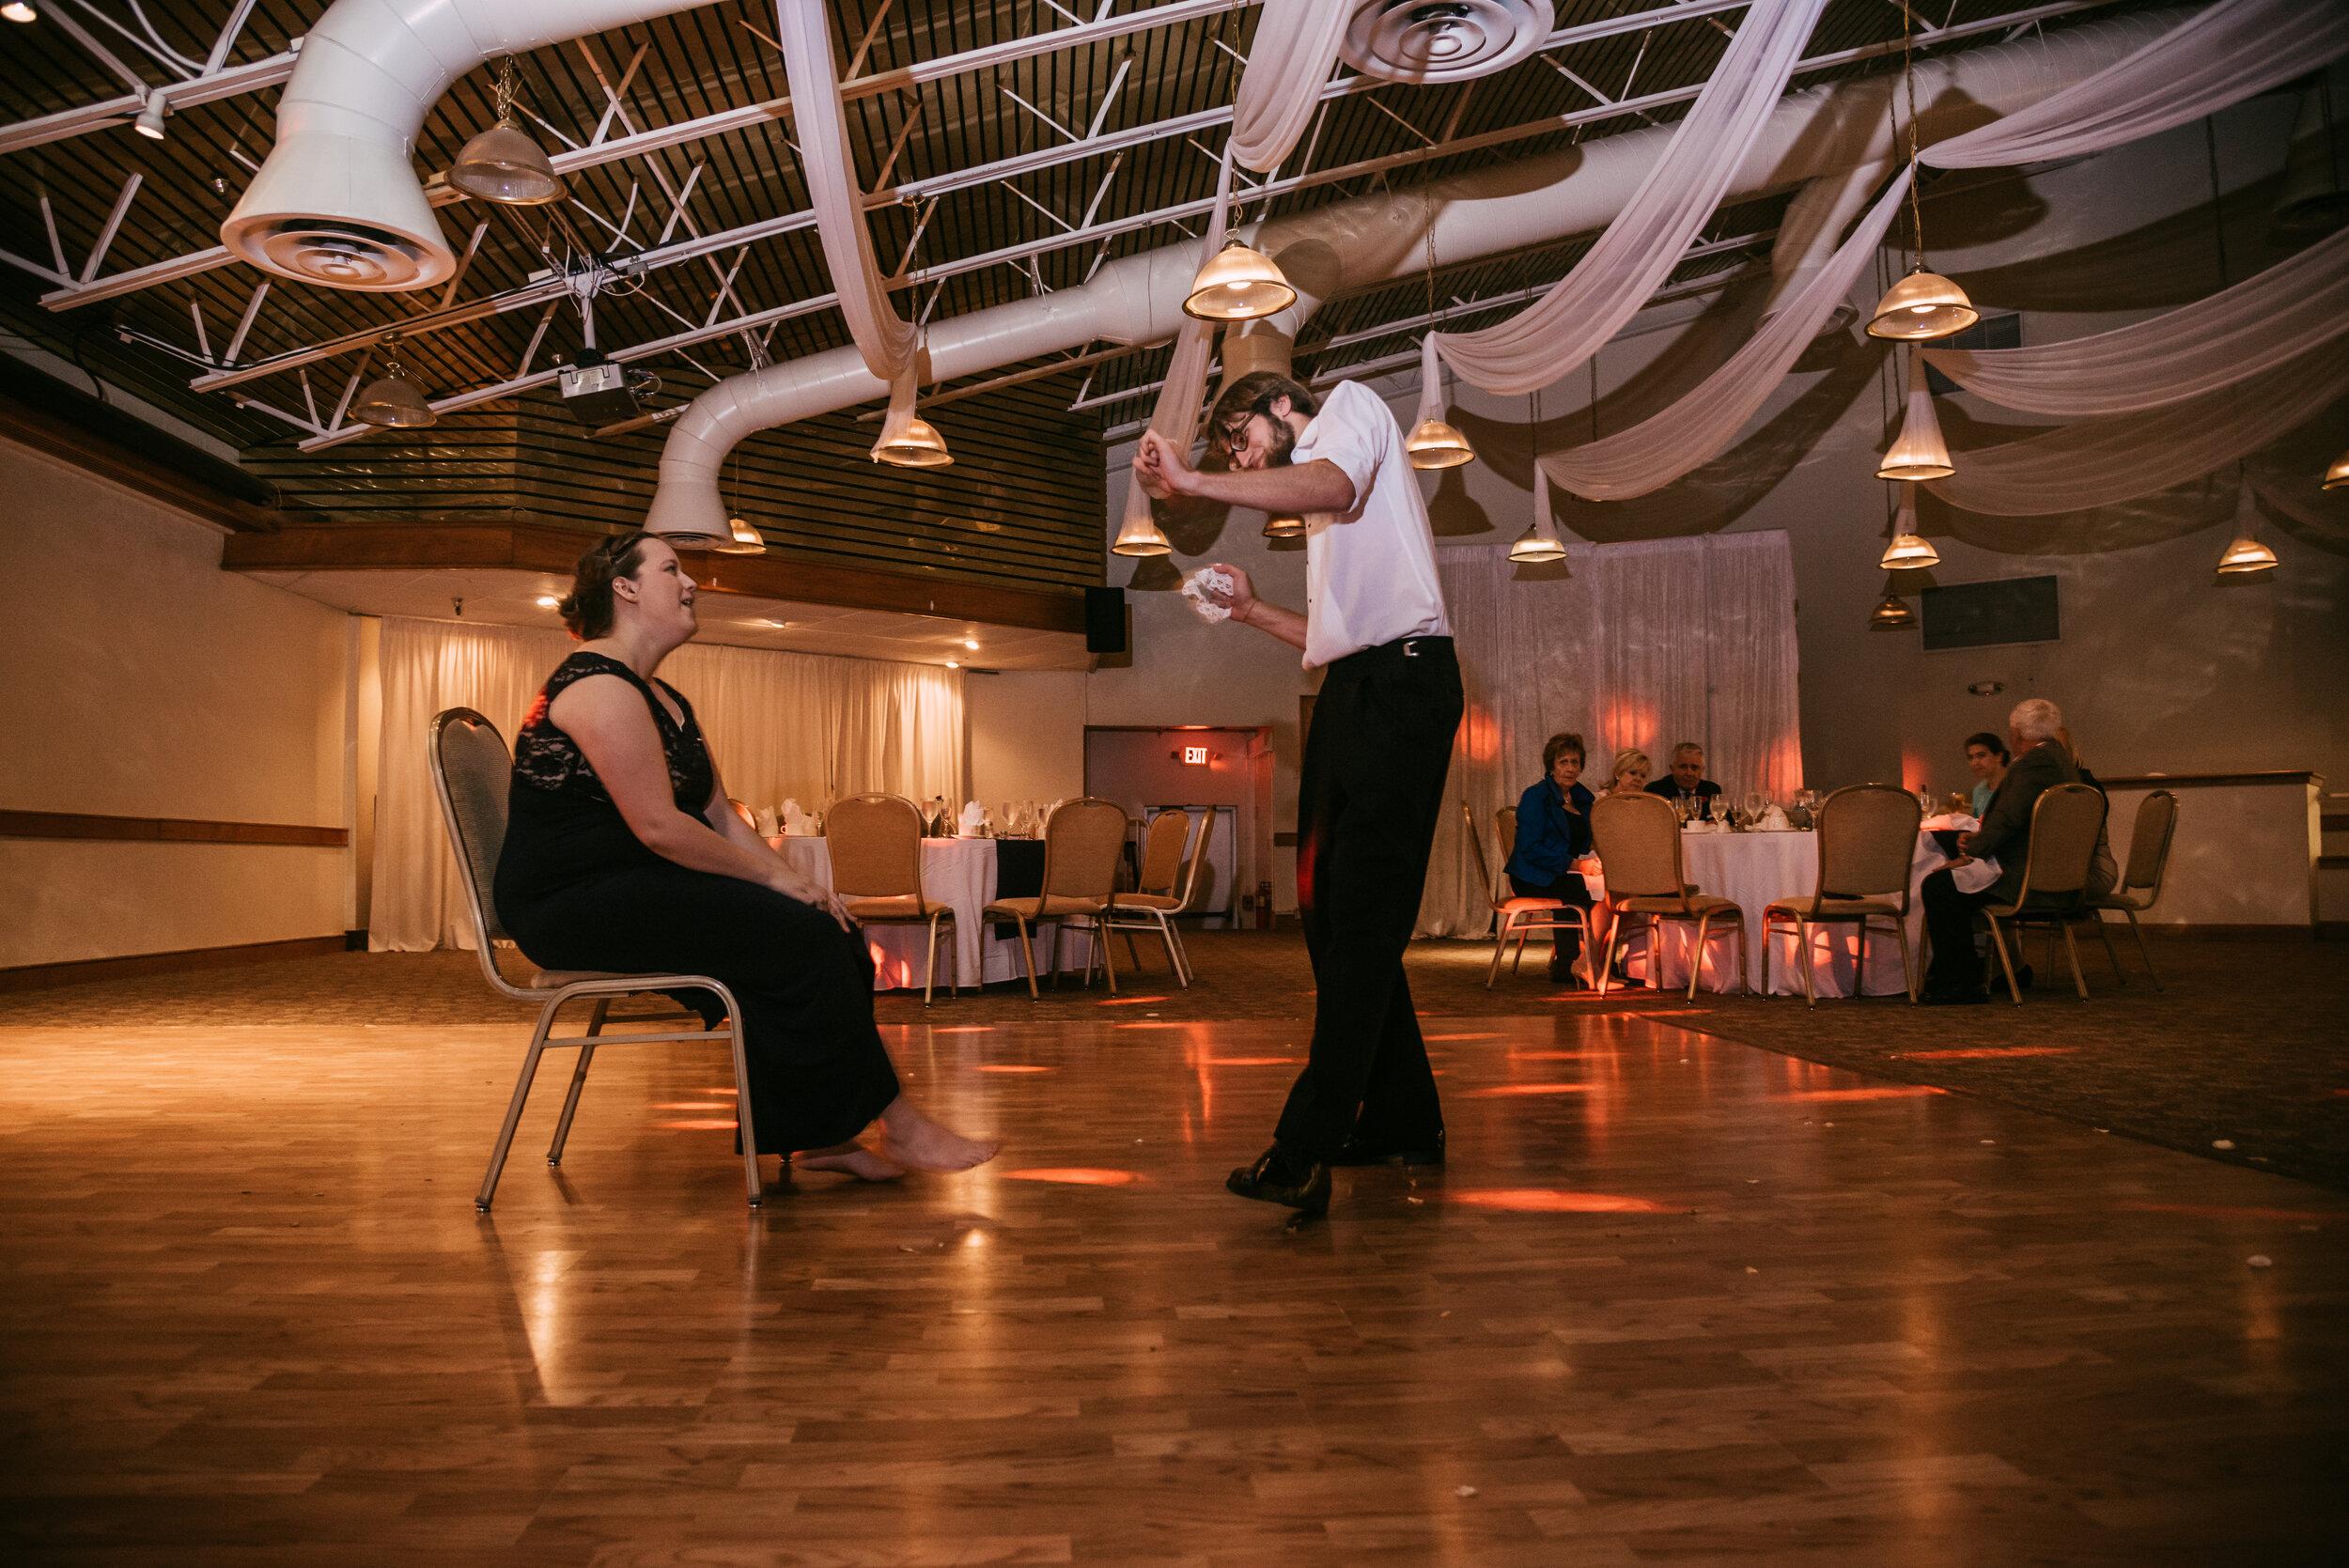 andru-the-tide-club-air-force-wedding-patrickafb-1-169.jpg